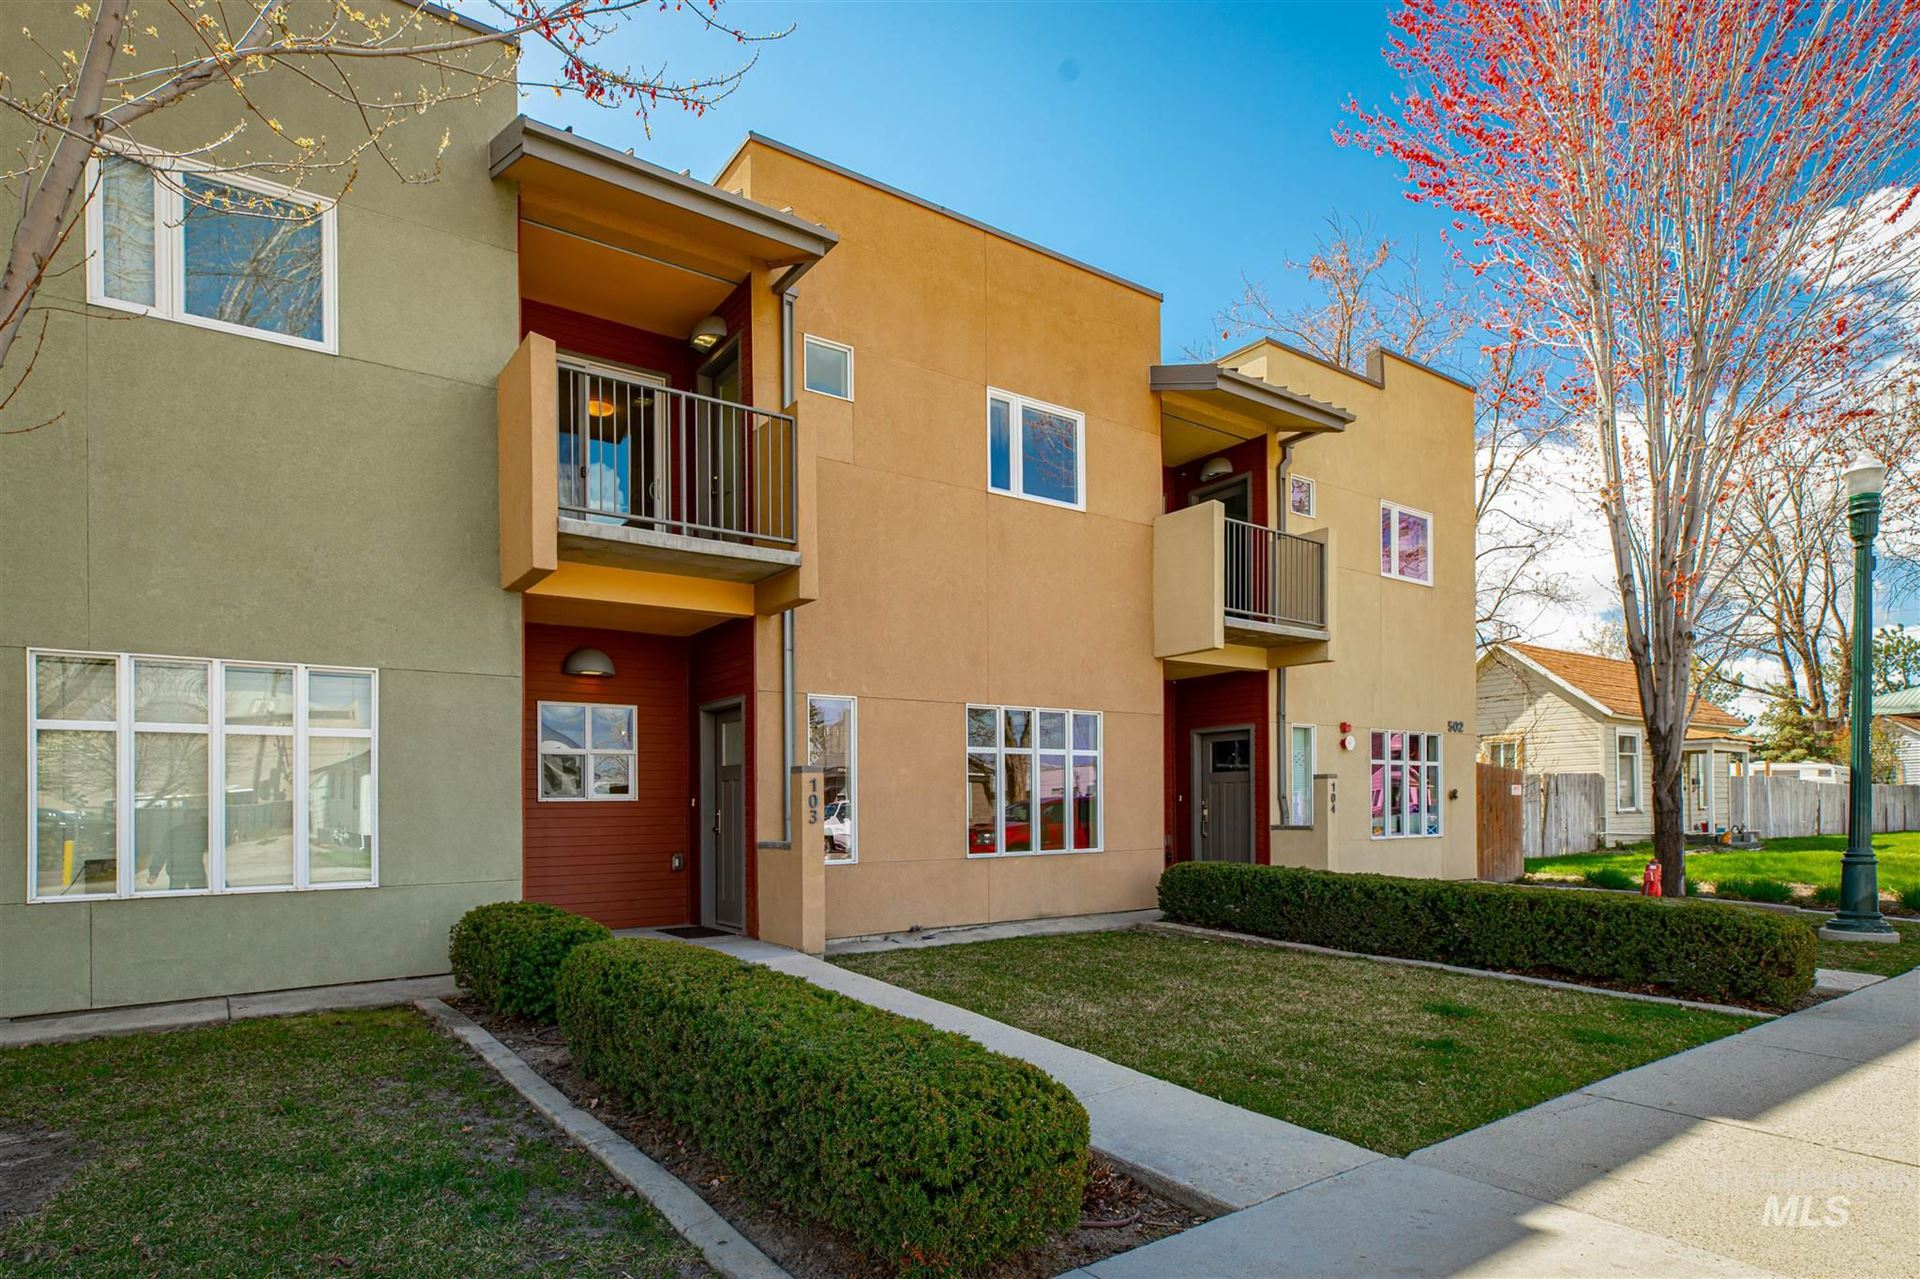 Photo of 502 S 15th St. #103, Boise, ID 83702 (MLS # 98799046)